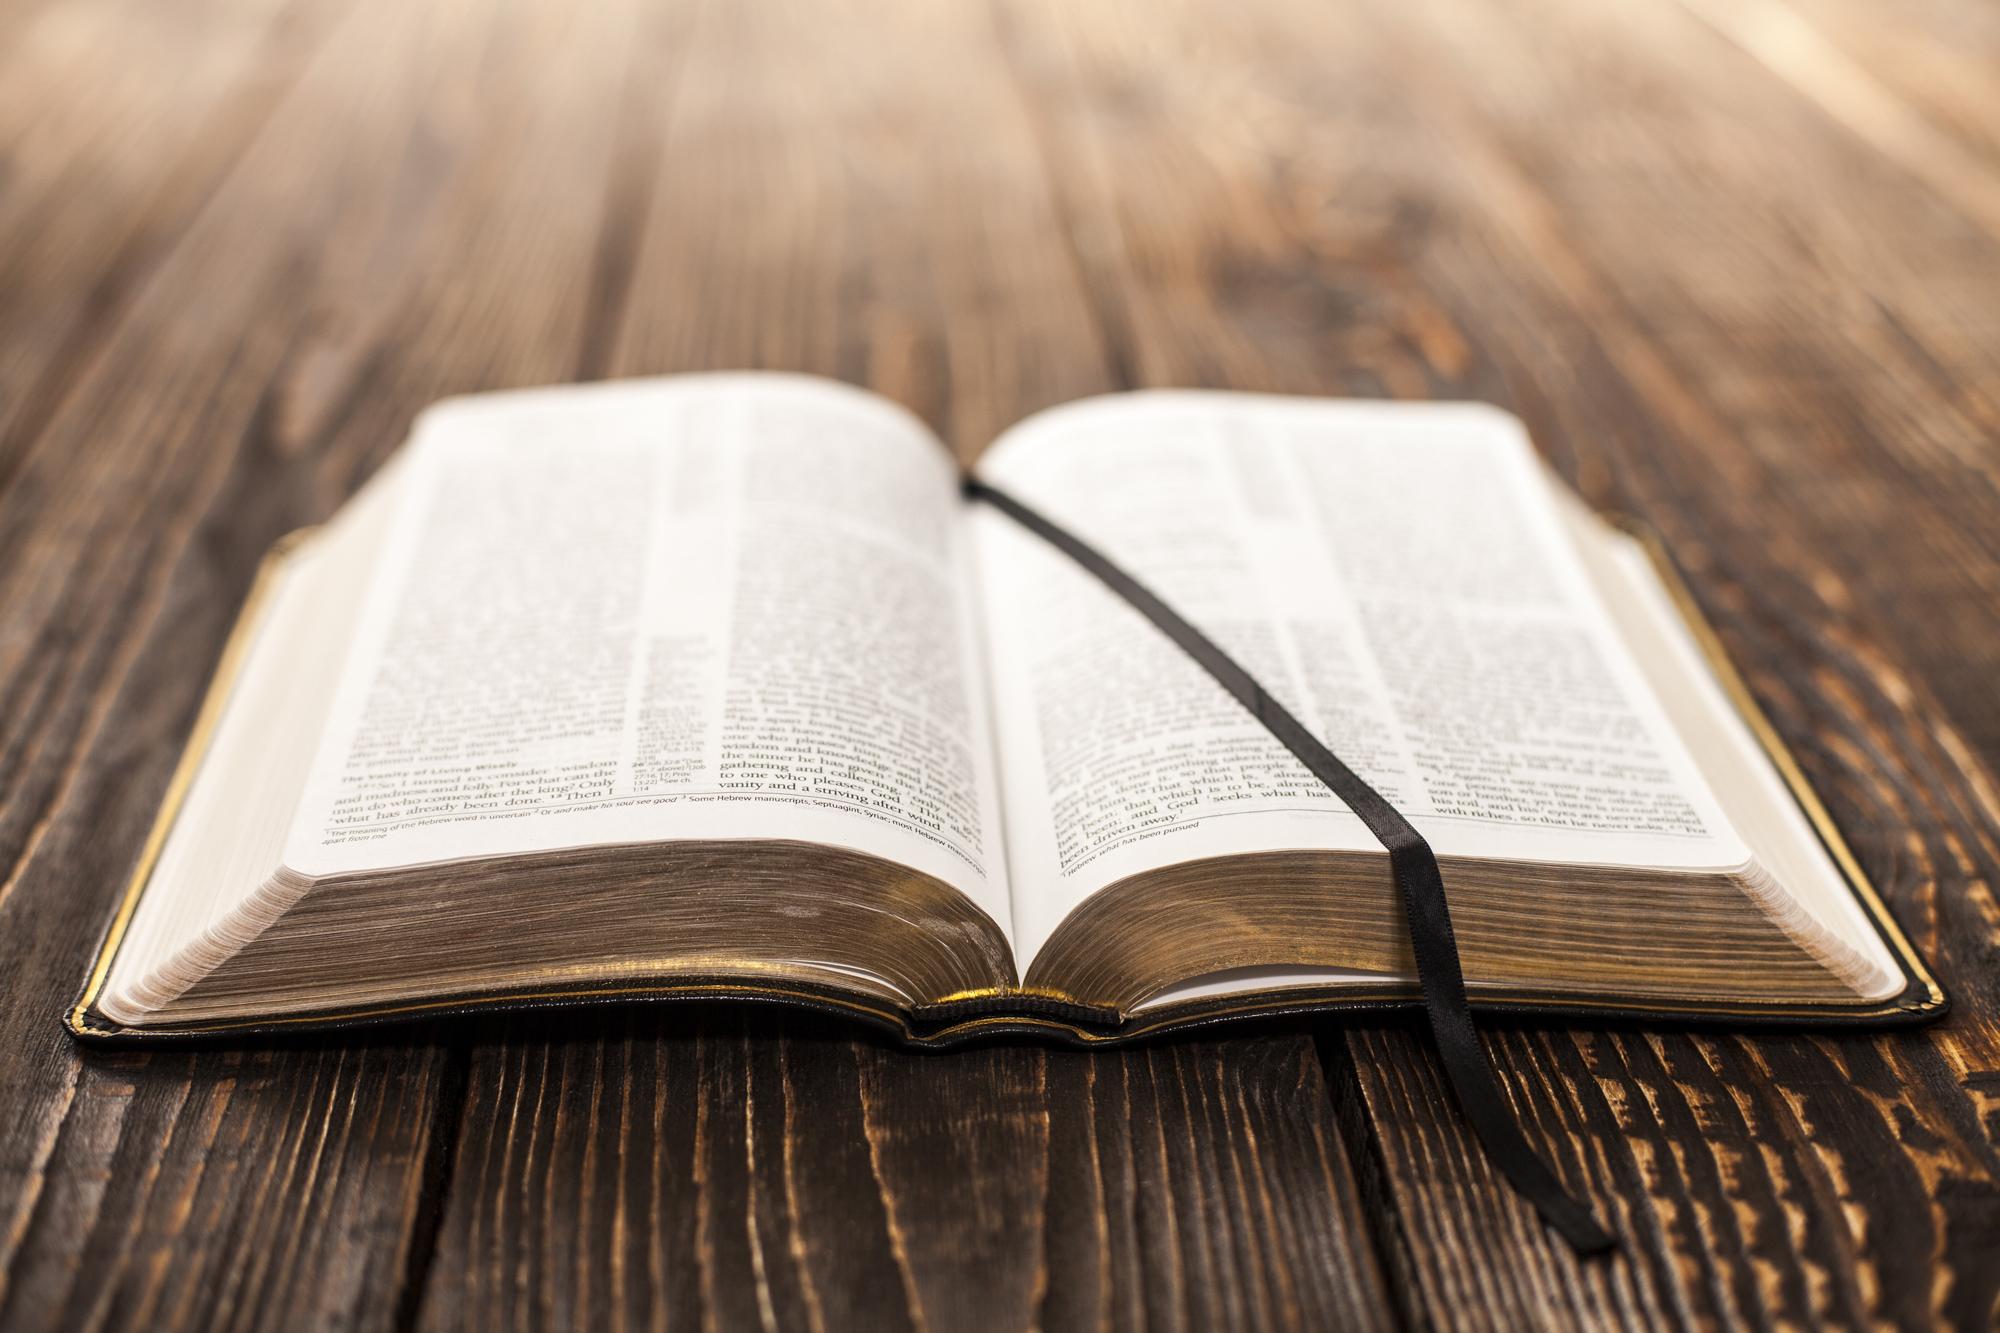 Communicating God's Word